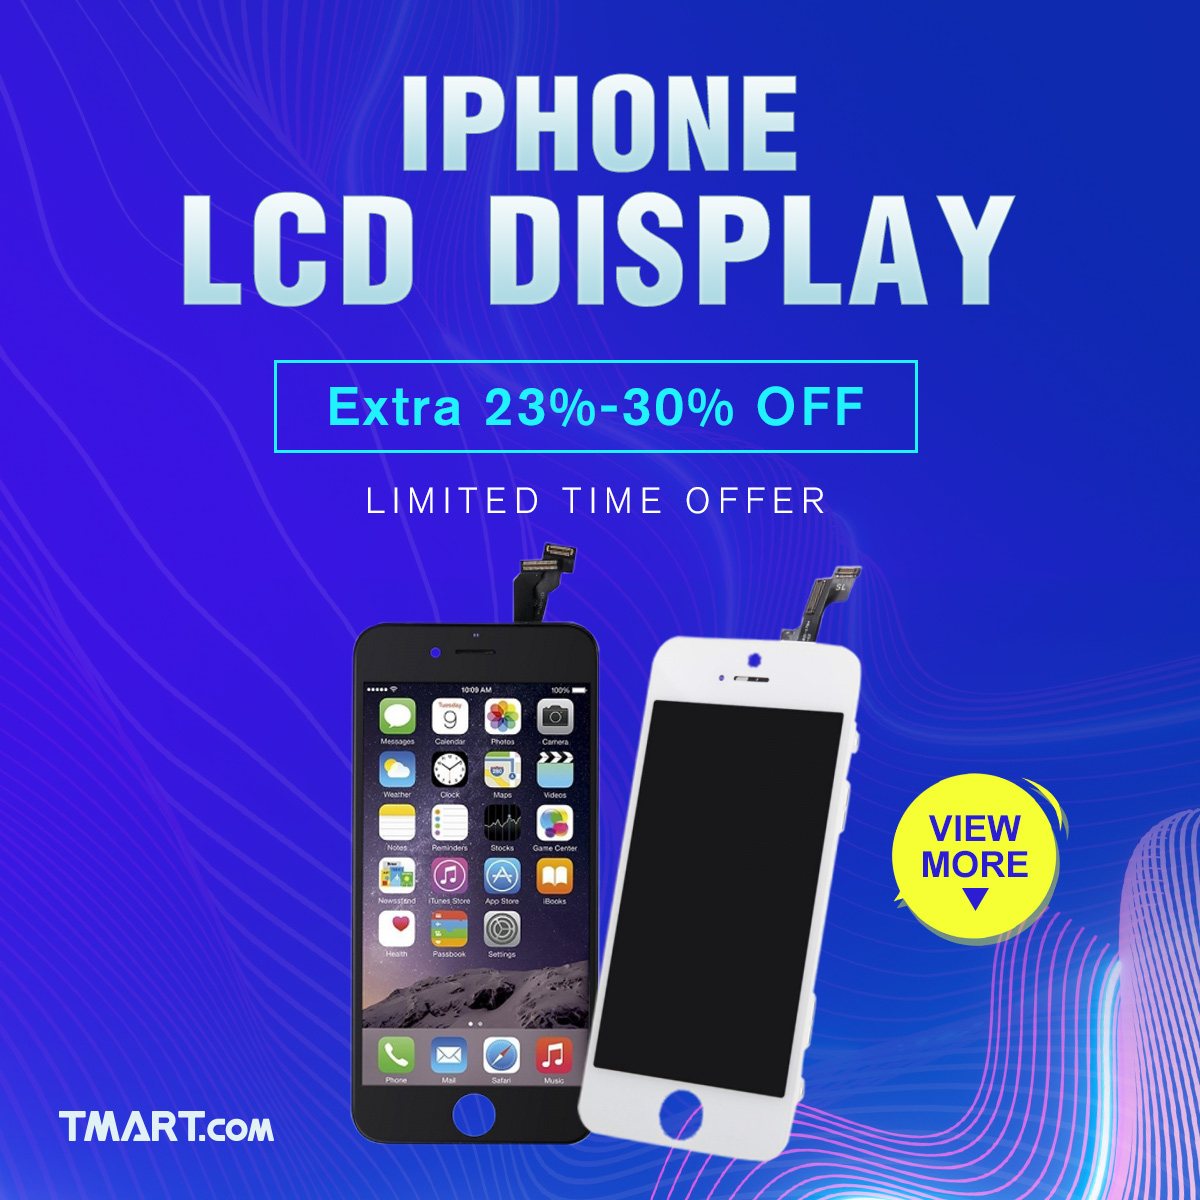 iPhone LCD Display Sale